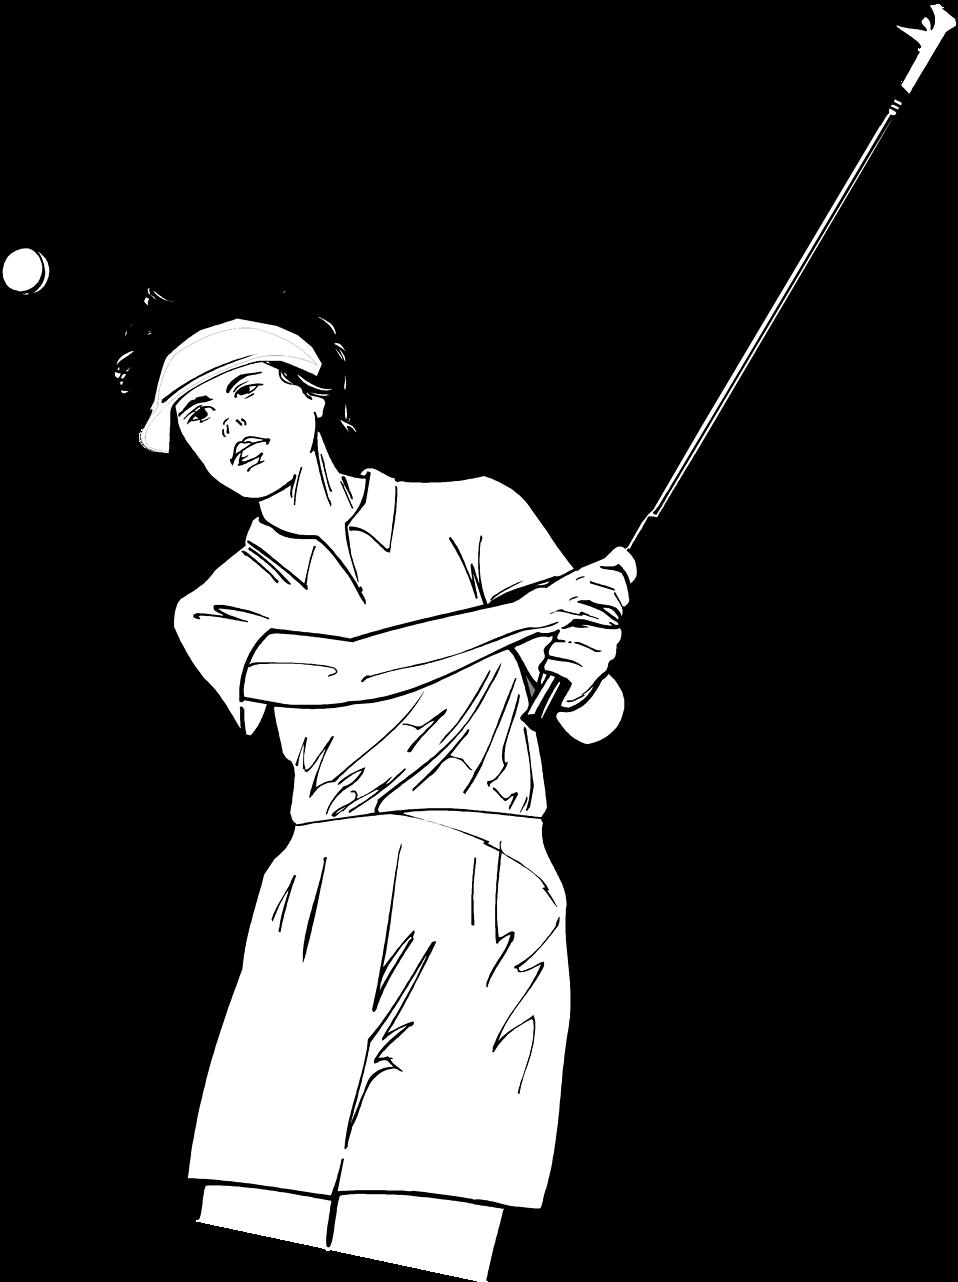 Golfer clipart female golfer. Golf woman free stock